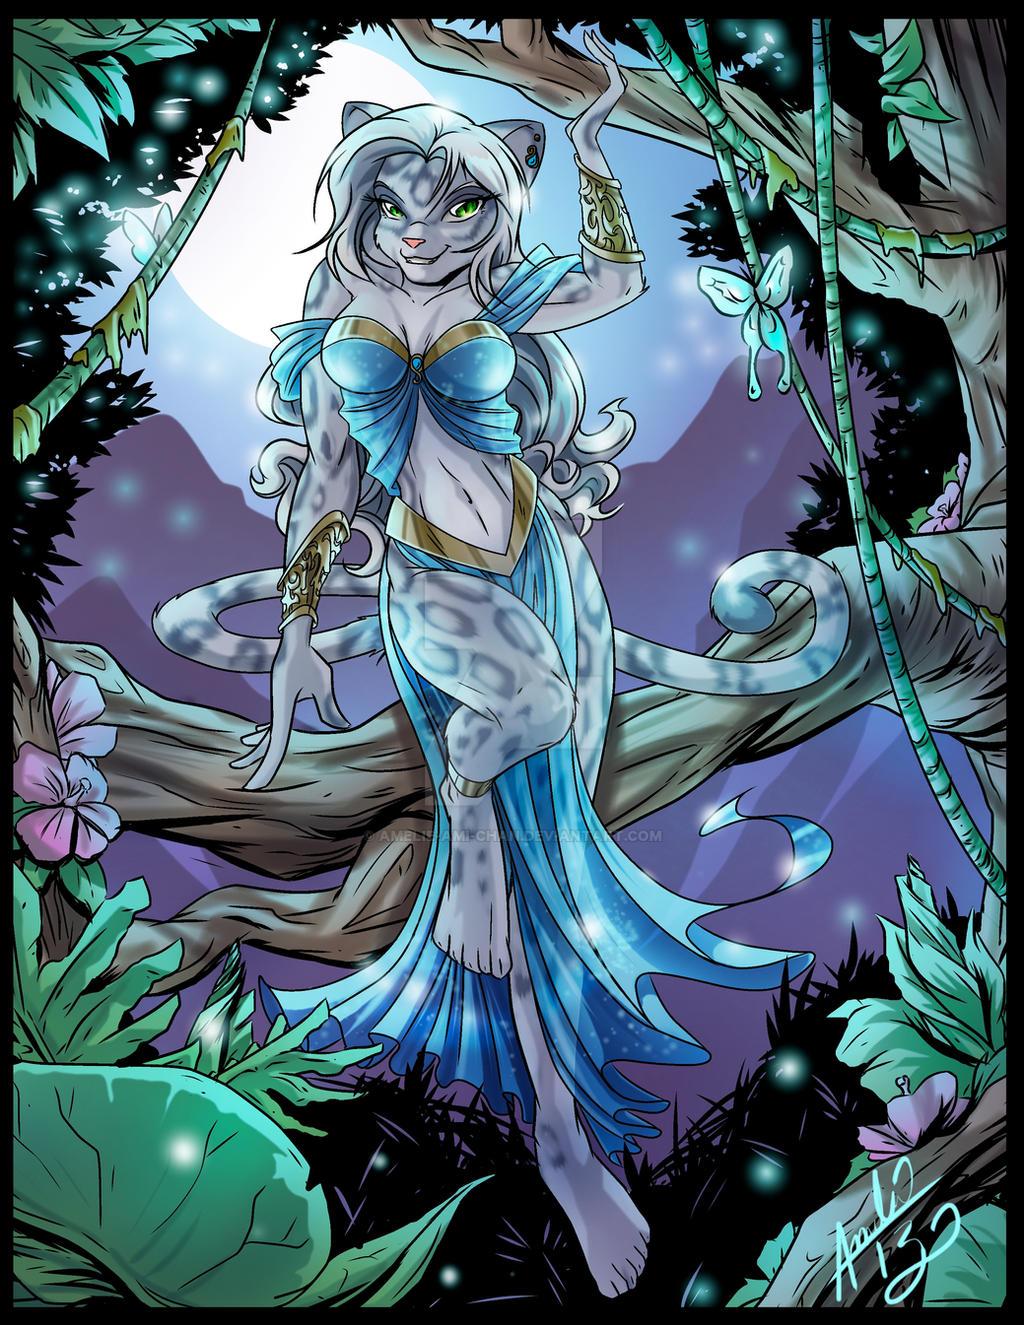 Pin on The Little Mermaid!